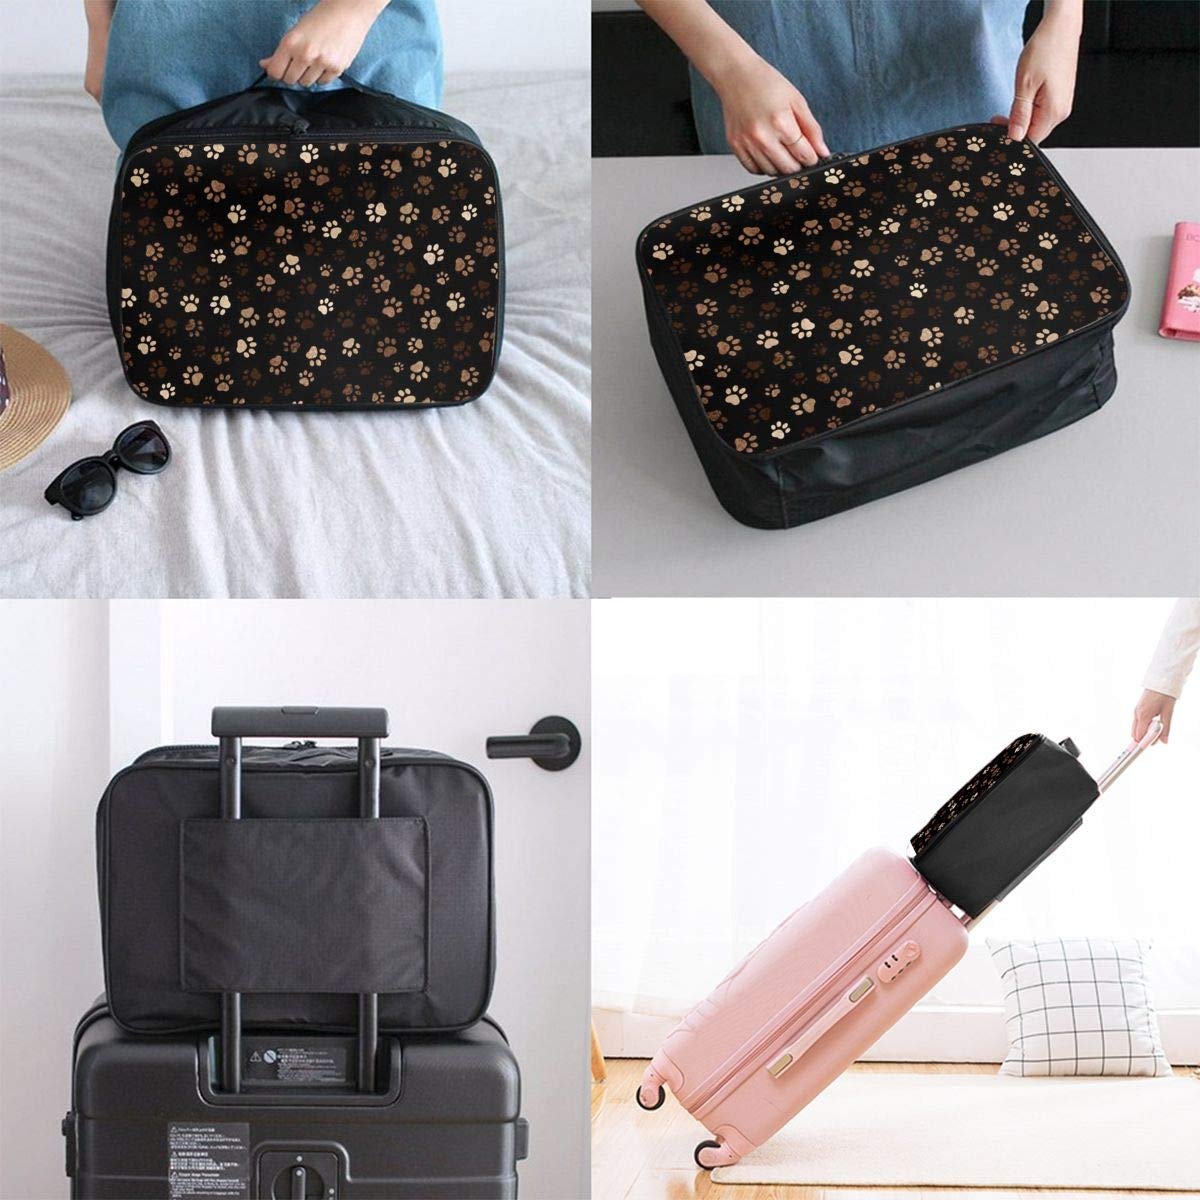 ADGAI Bear Footprint Canvas Travel Weekender Bag,Fashion Custom Lightweight Large Capacity Portable Luggage Bag,Suitcase Trolley Bag